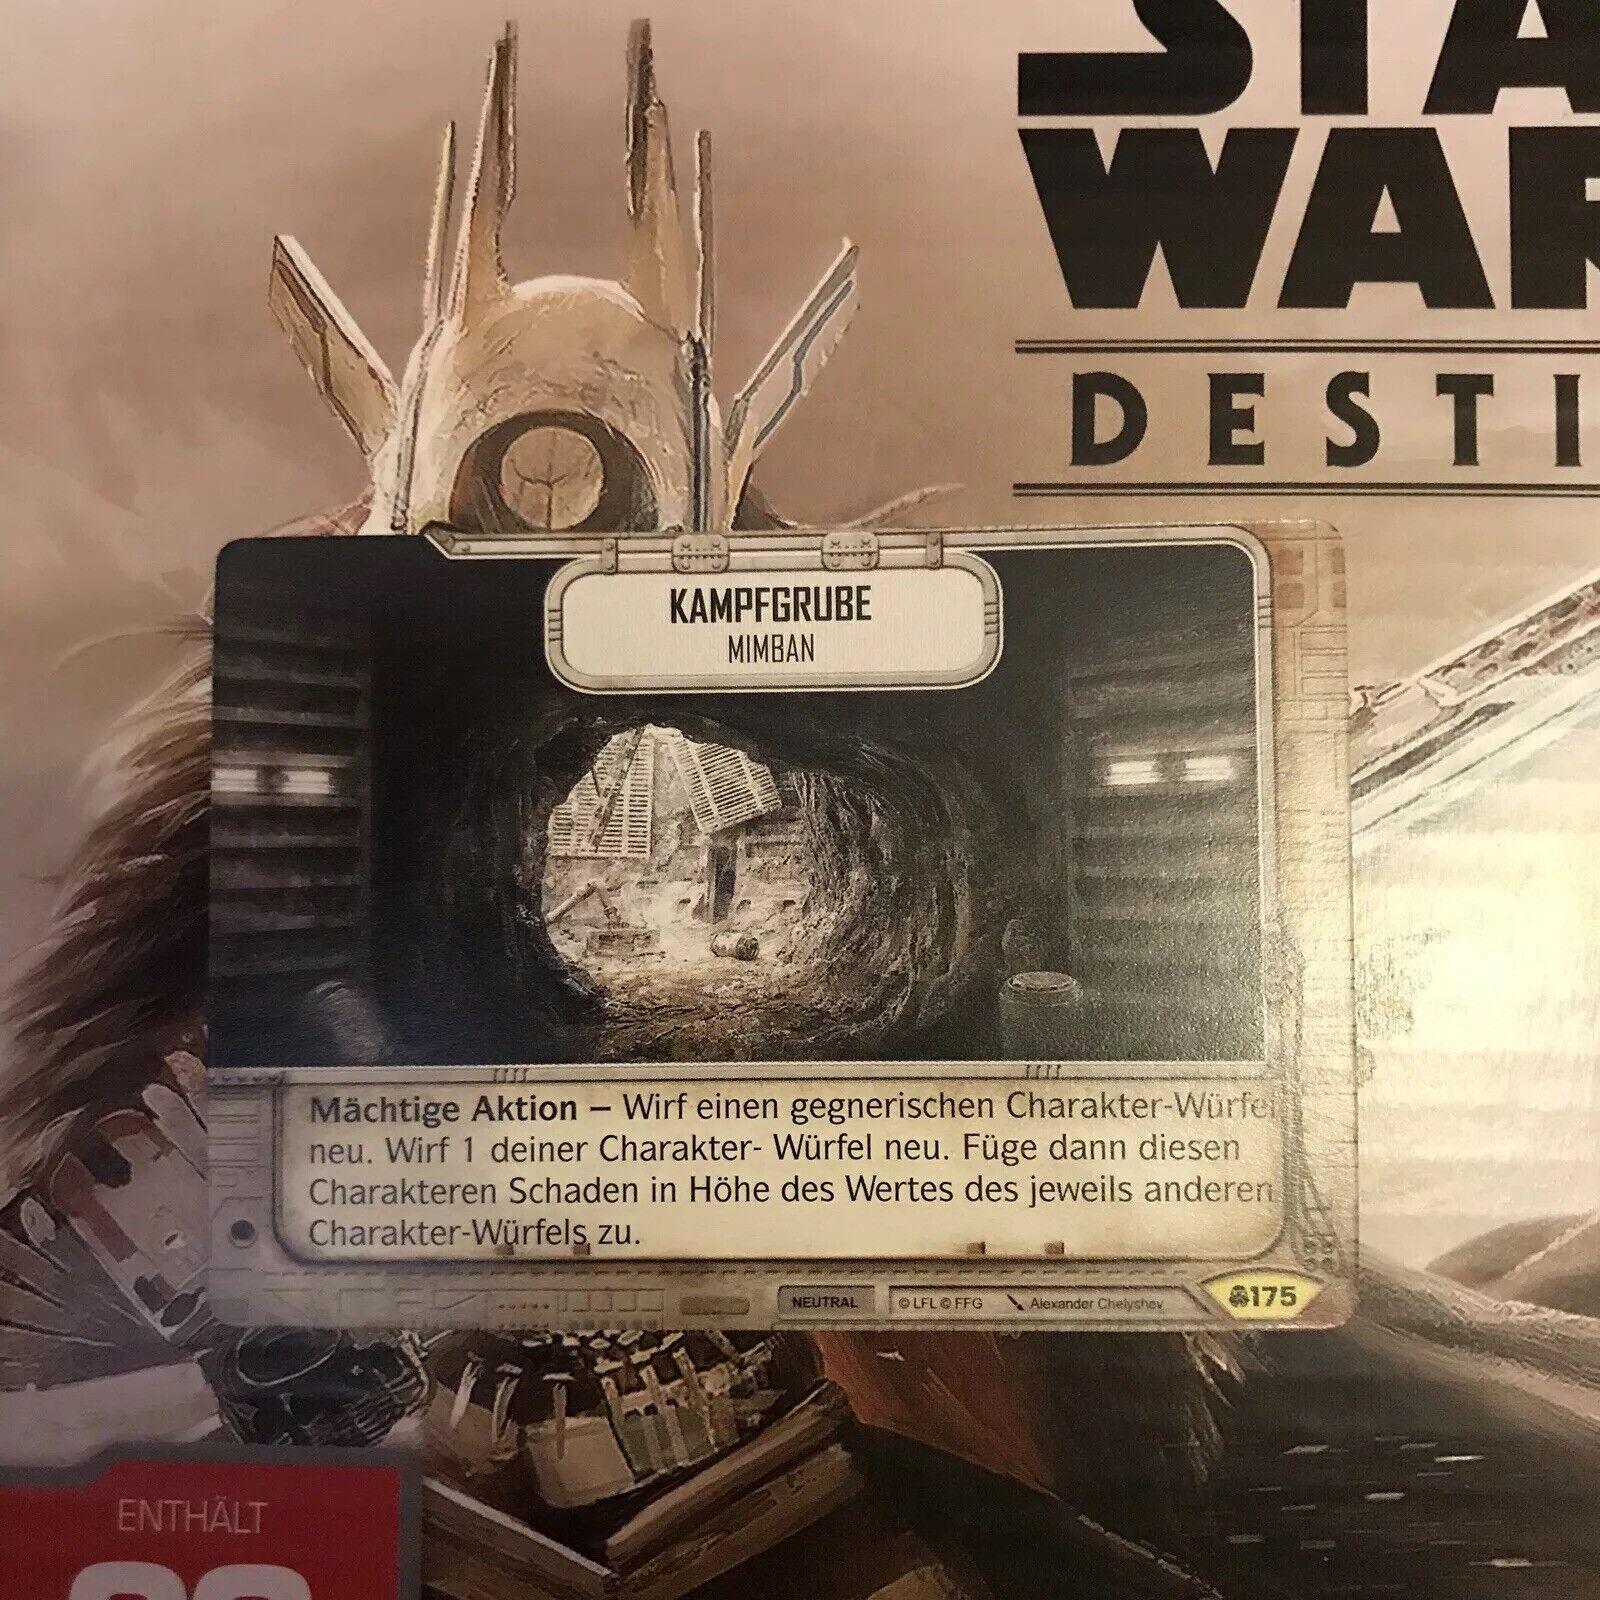 Star Wars Destiny Konvergenz #175 Kampfgrube Uncommon DE Mint